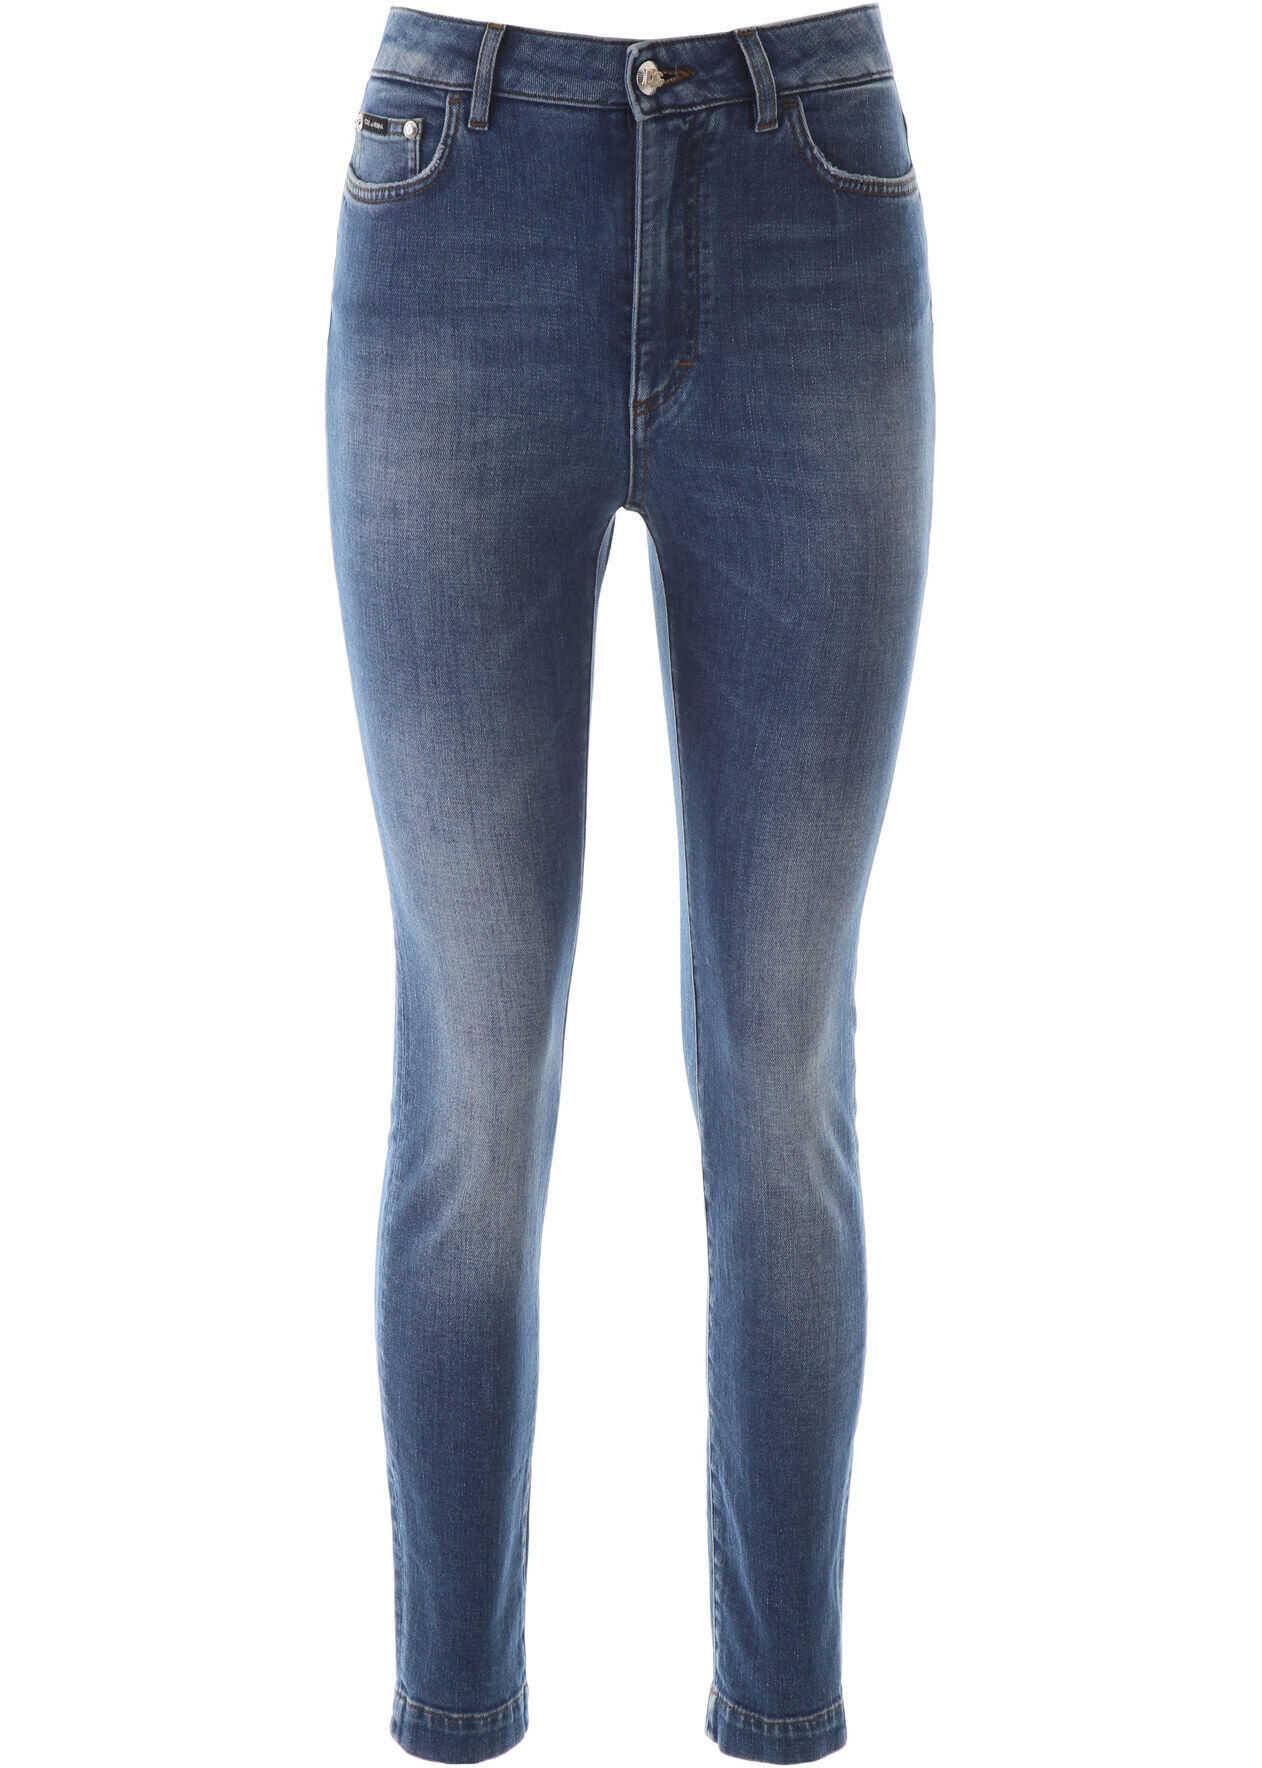 Dolce & Gabbana Audrey Fit Jeans BLU SCURISSIMO 5